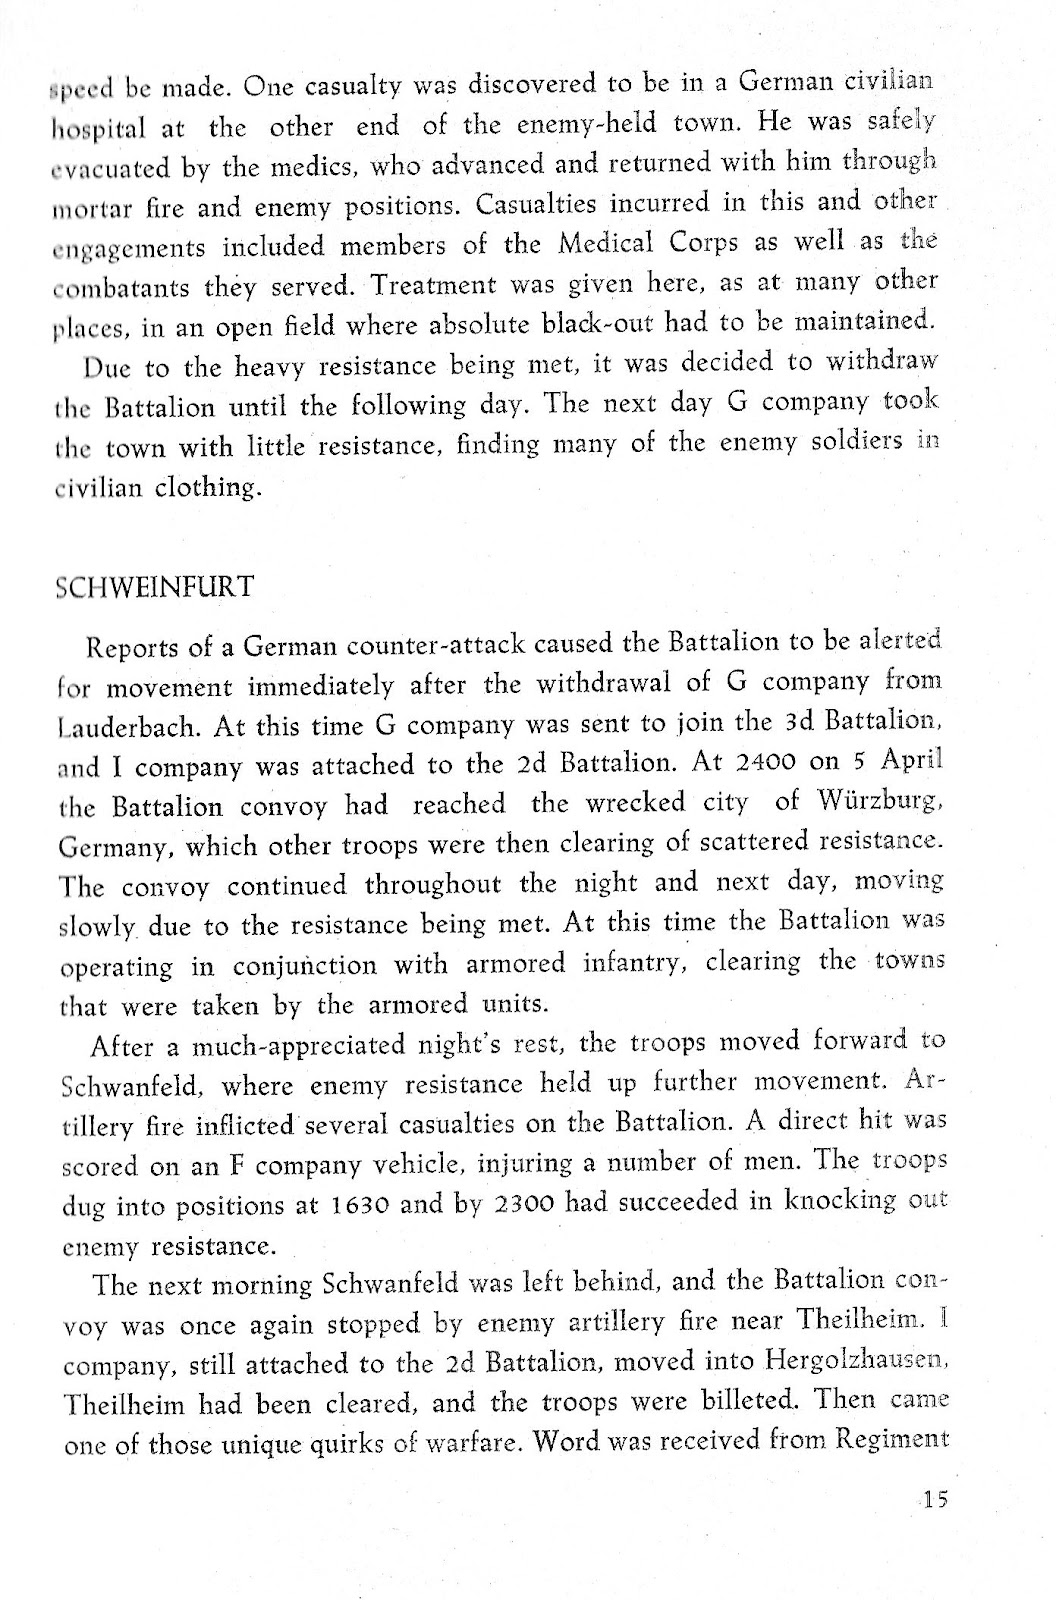 History pg15.jpg